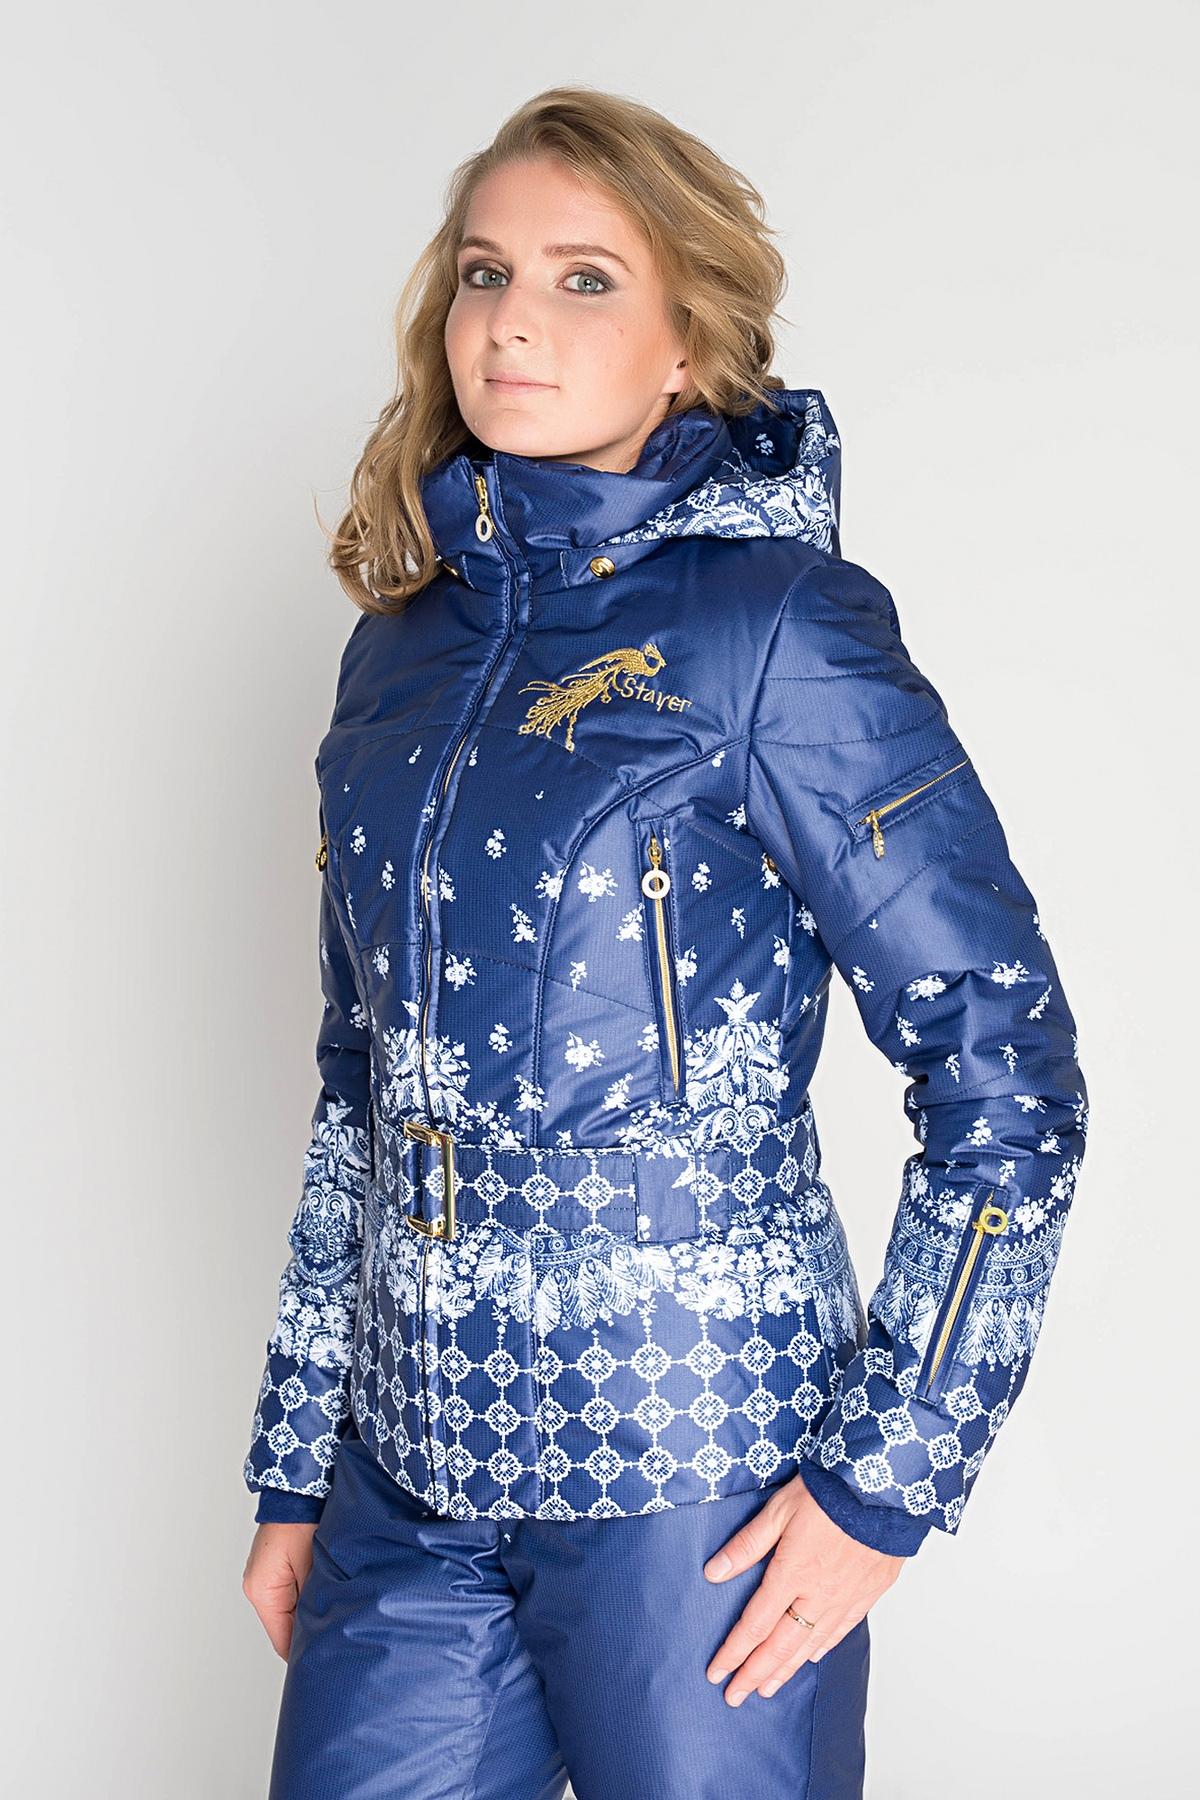 87b0106d Куртка утепленная Stayer зима мембранная синяя женская артикул 15 ...